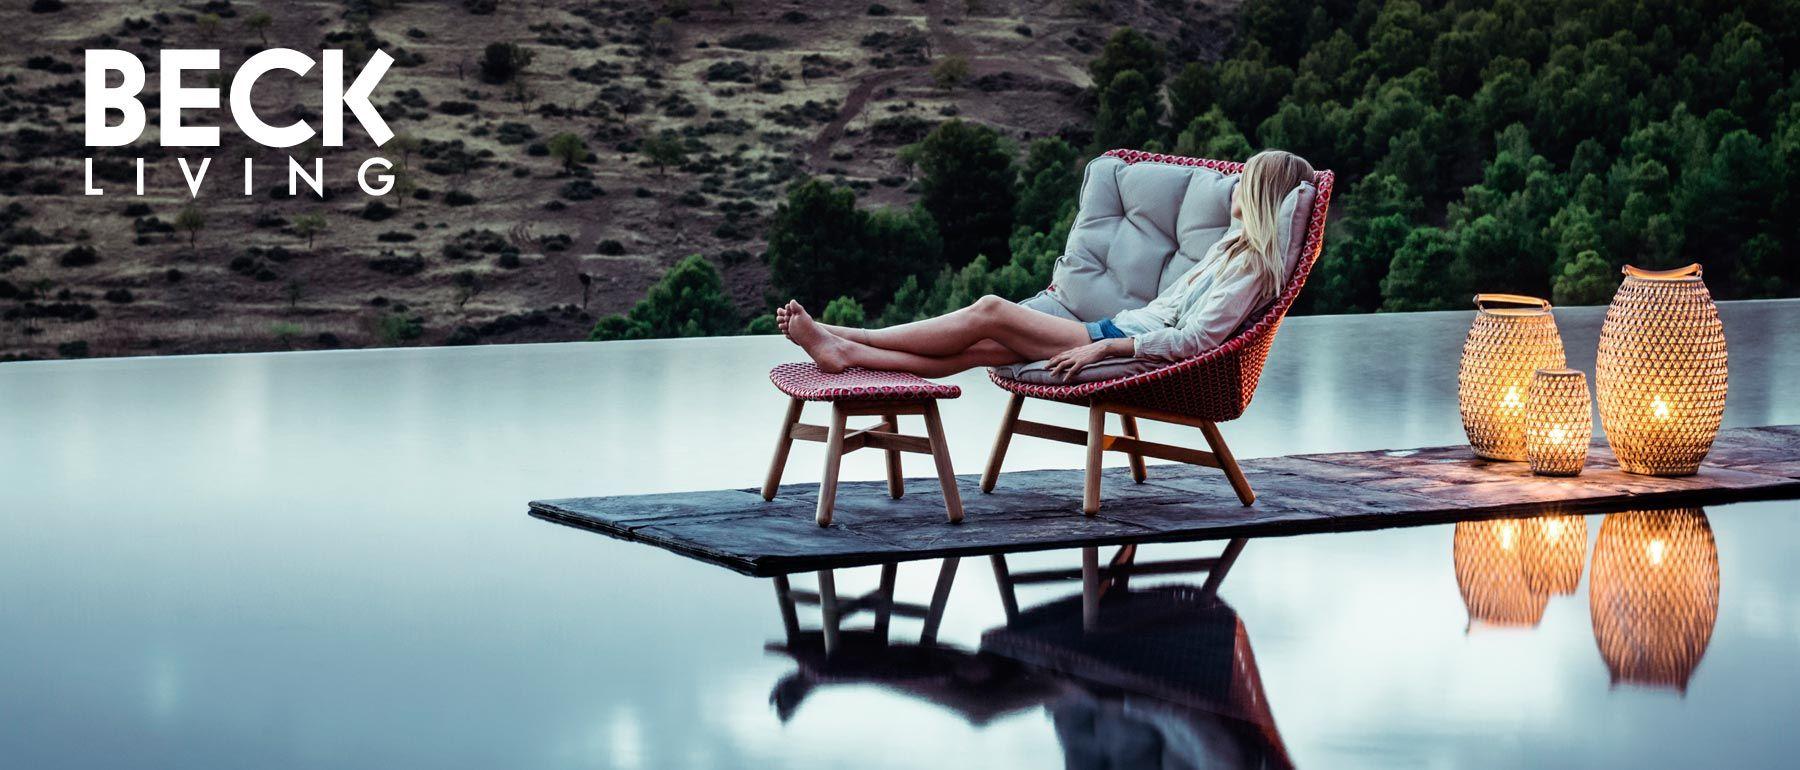 Exklusive Terrassenmöbel beck living exklusive gartenmoebel terrassenmoebel wellnessmoebel